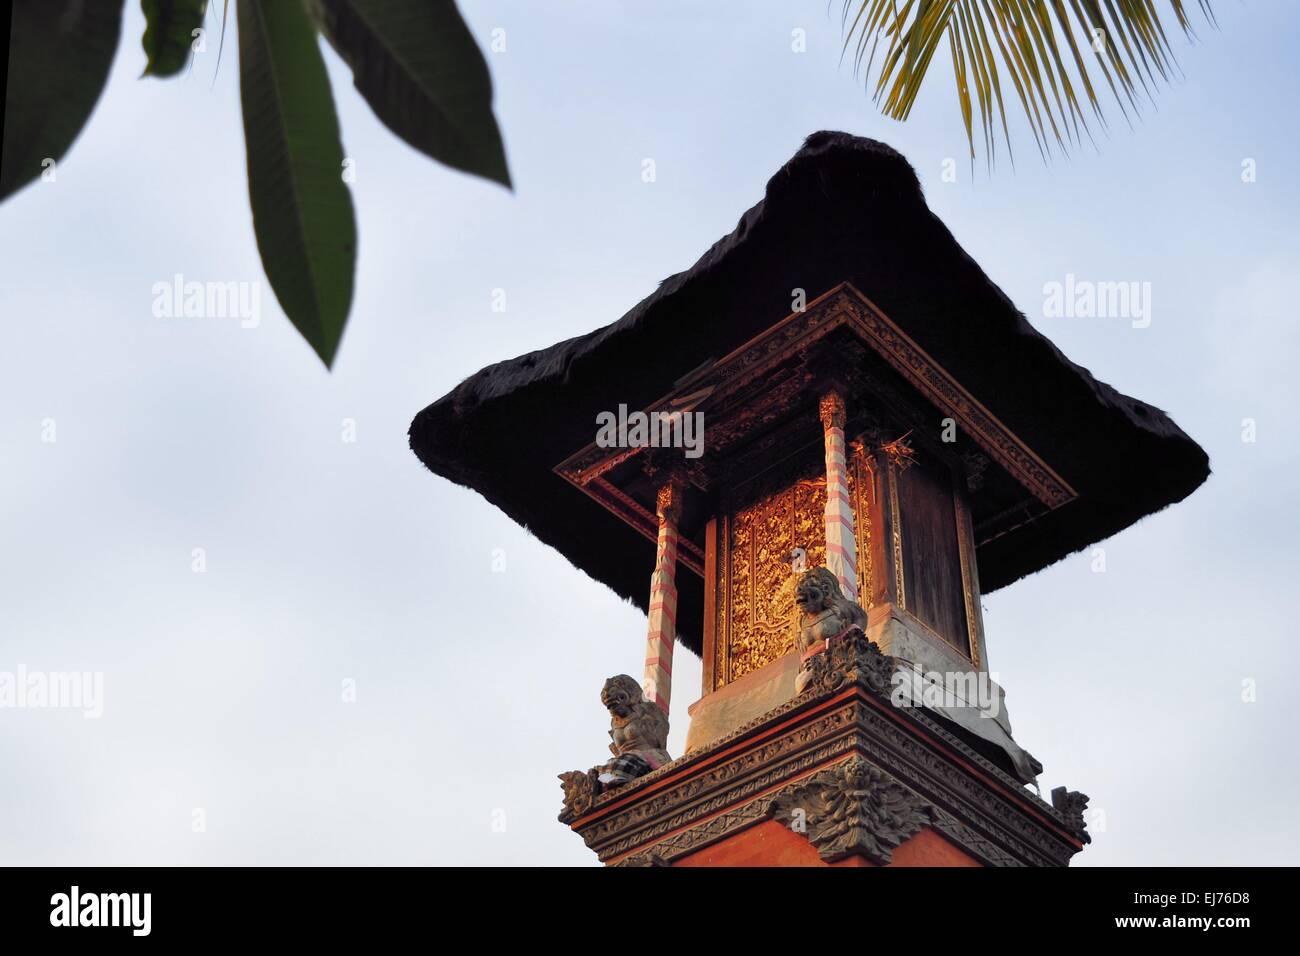 Little Hindu shrine in Ubud, Bali, Indonesia - Stock Image